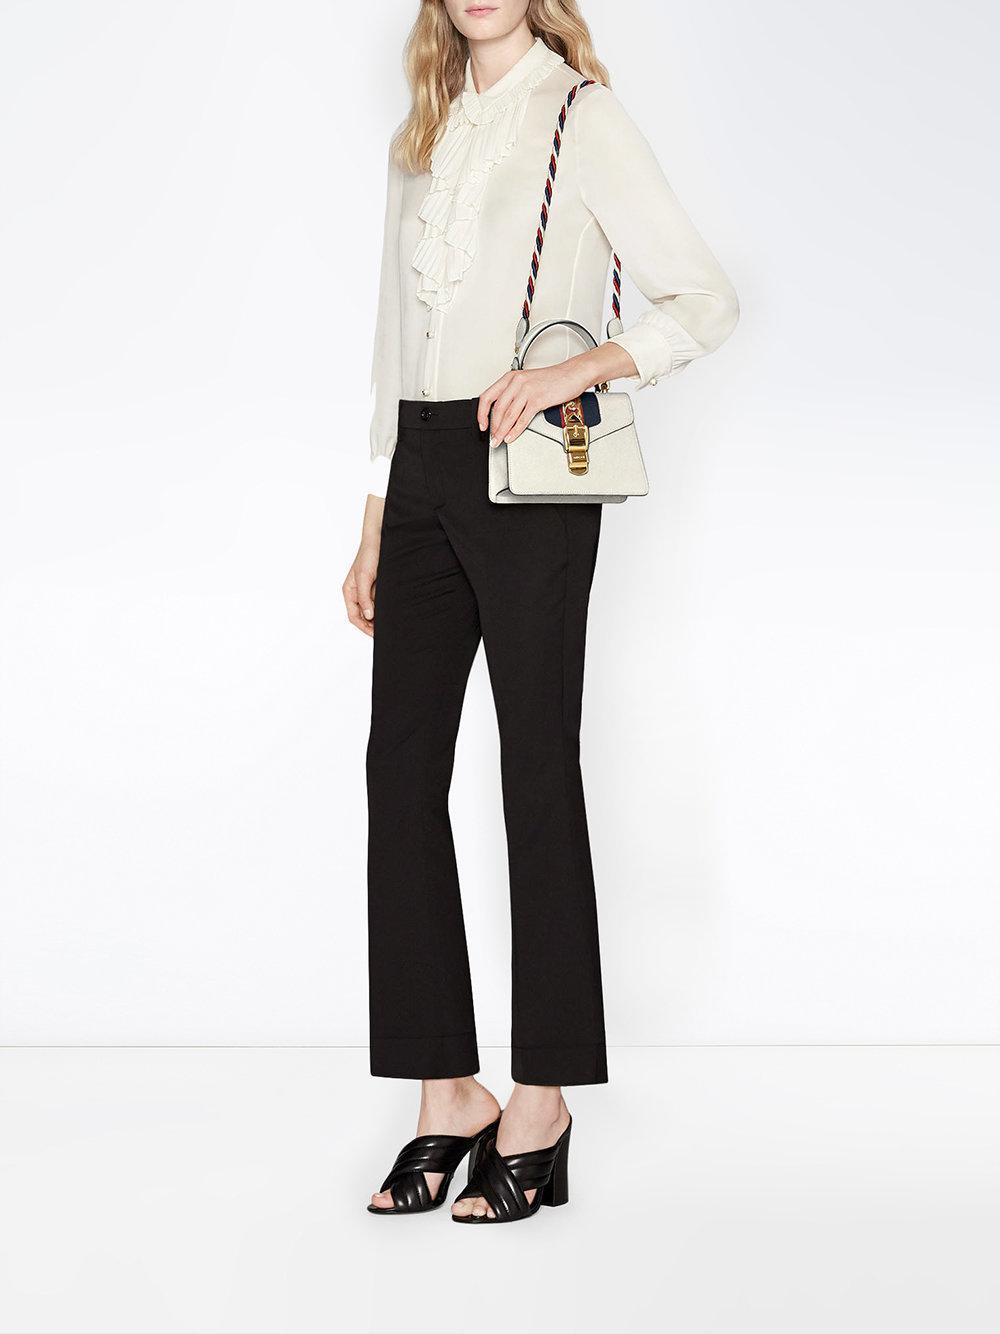 5dd43b36098 Gucci - White Mini Sylvie Leather Shoulder Bag - Lyst. View fullscreen